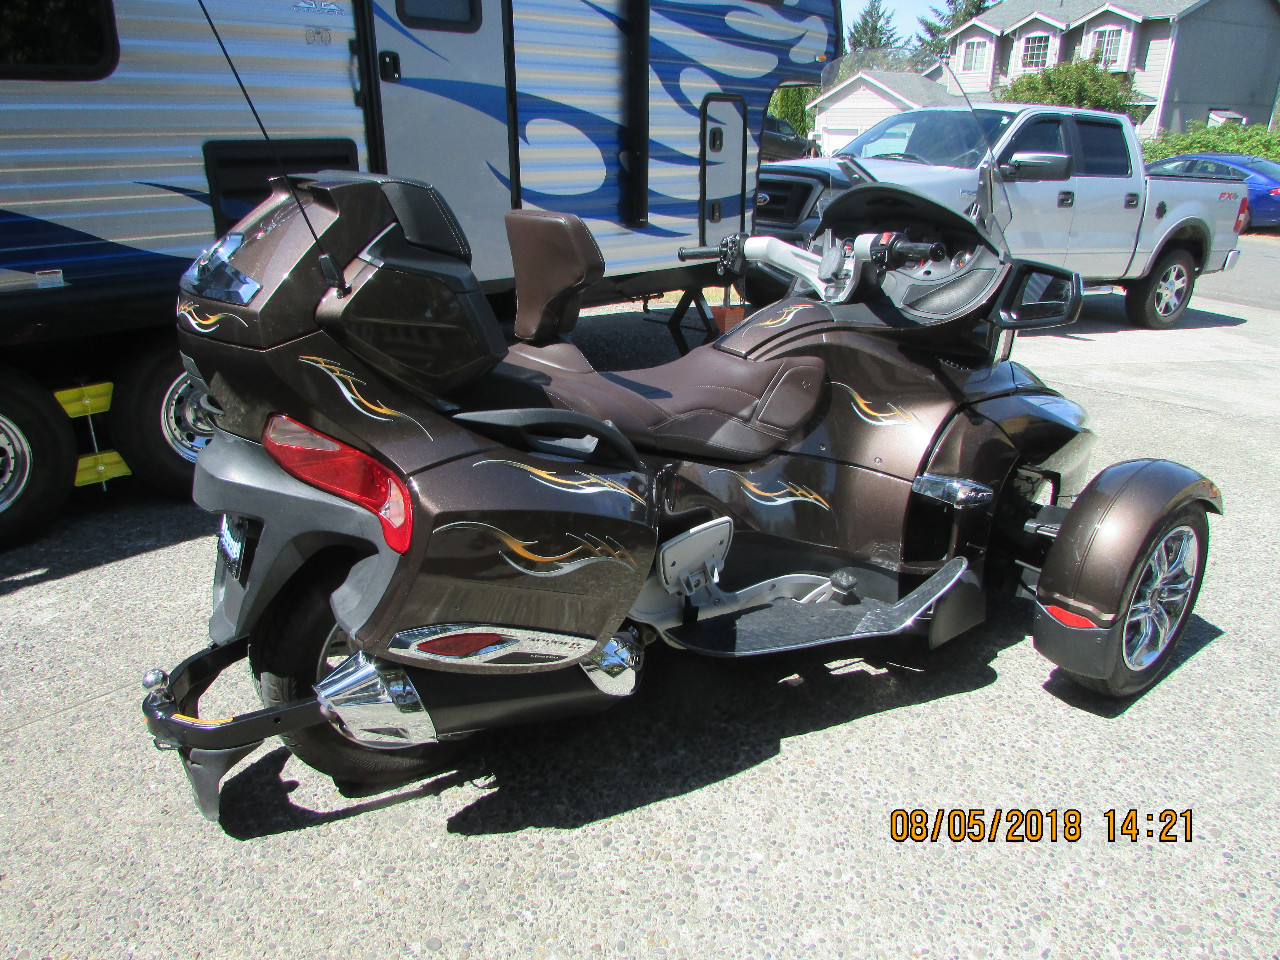 Washington 1134 Used Motorcycles For Sale Handle Hand Grip Handgrip Ninja Rr R Original